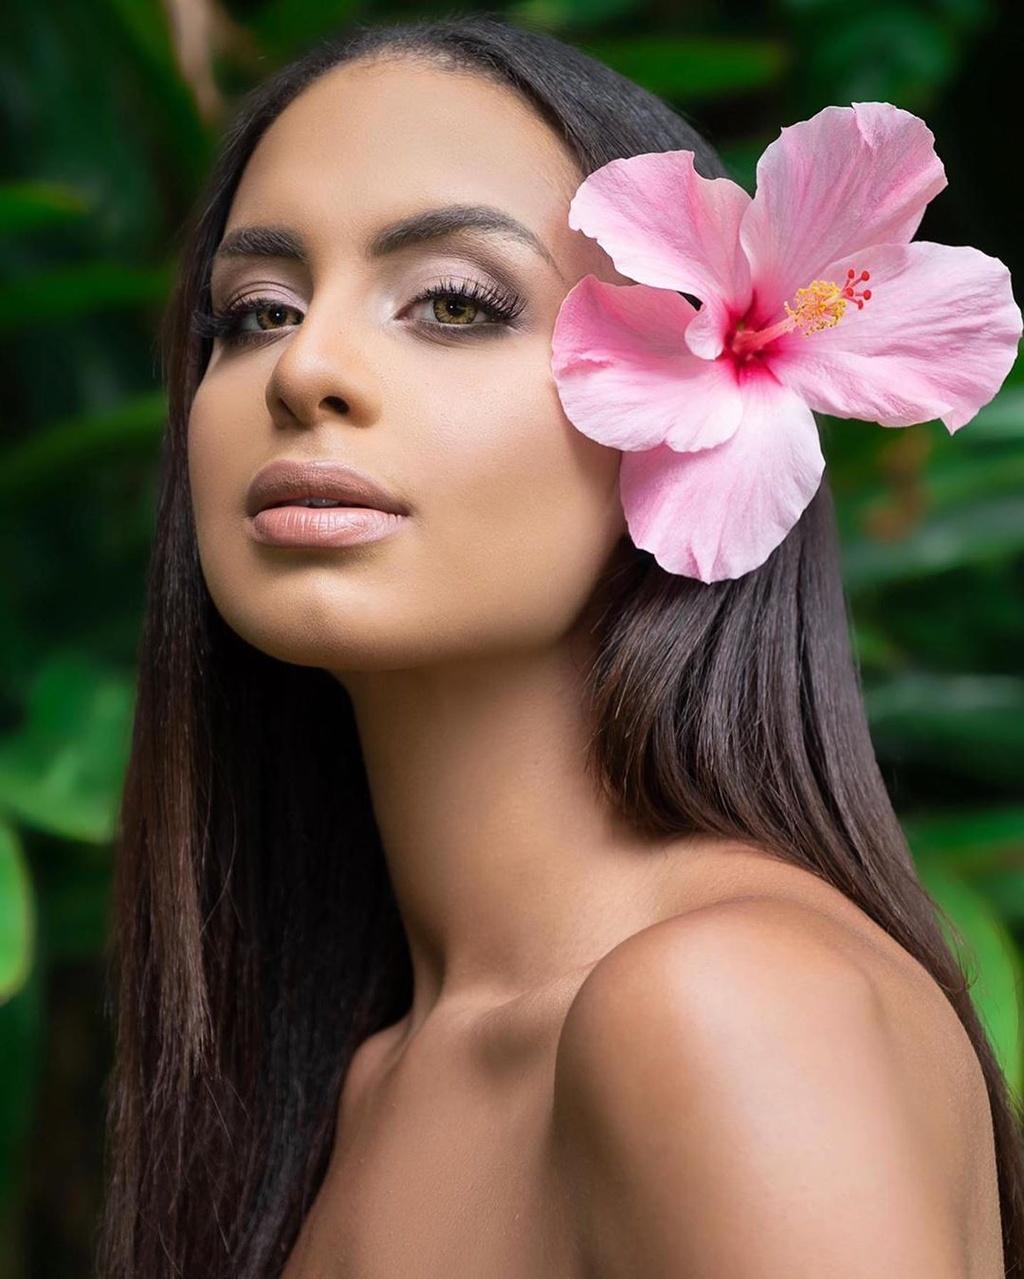 Ve dep cua nguoi mau 22 tuoi dang quang Hoa hau Trai Dat 2019 hinh anh 4